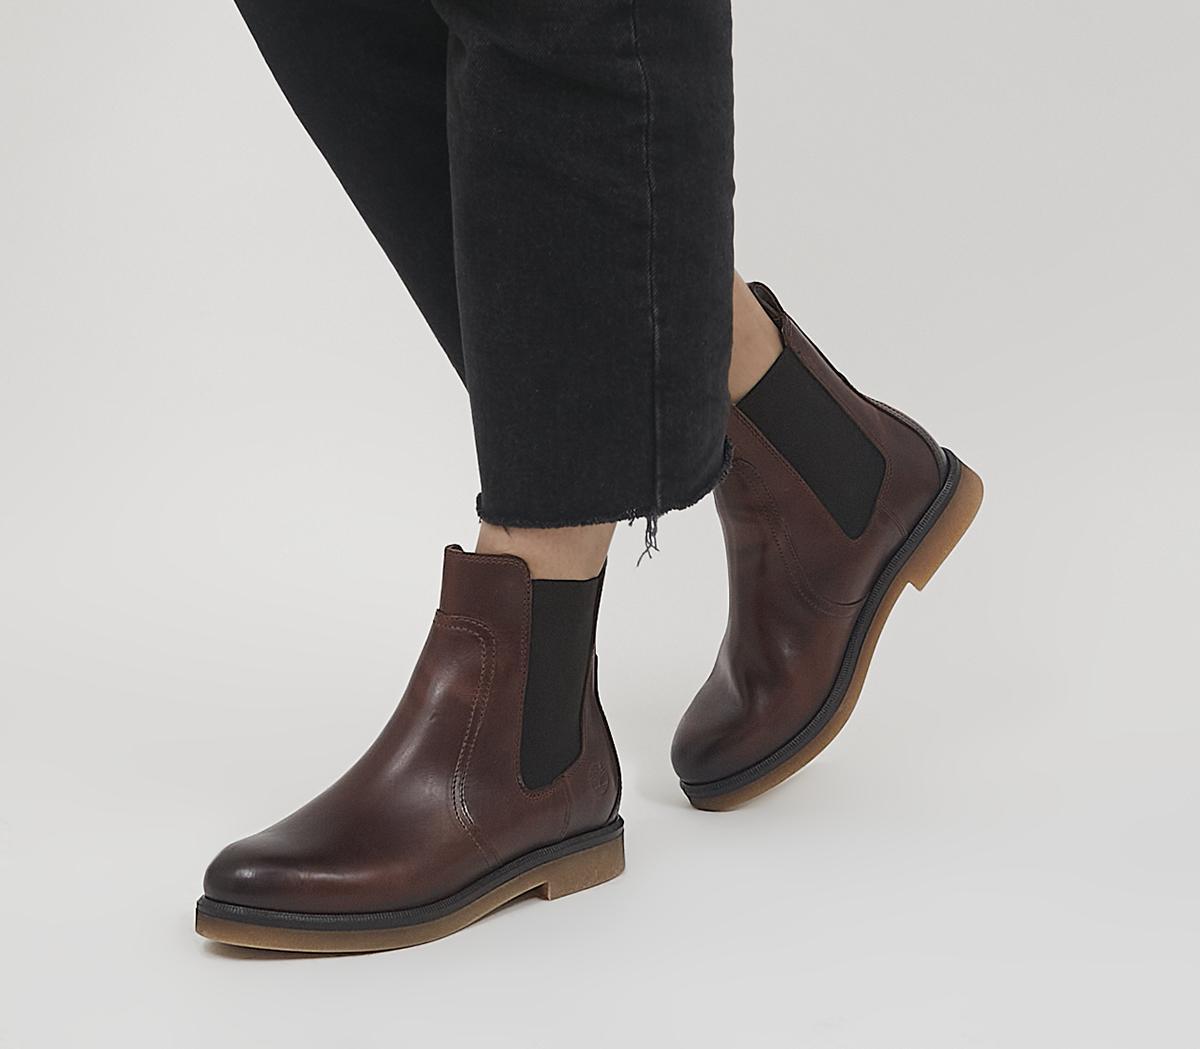 Cambridge Square Chelsea Boots